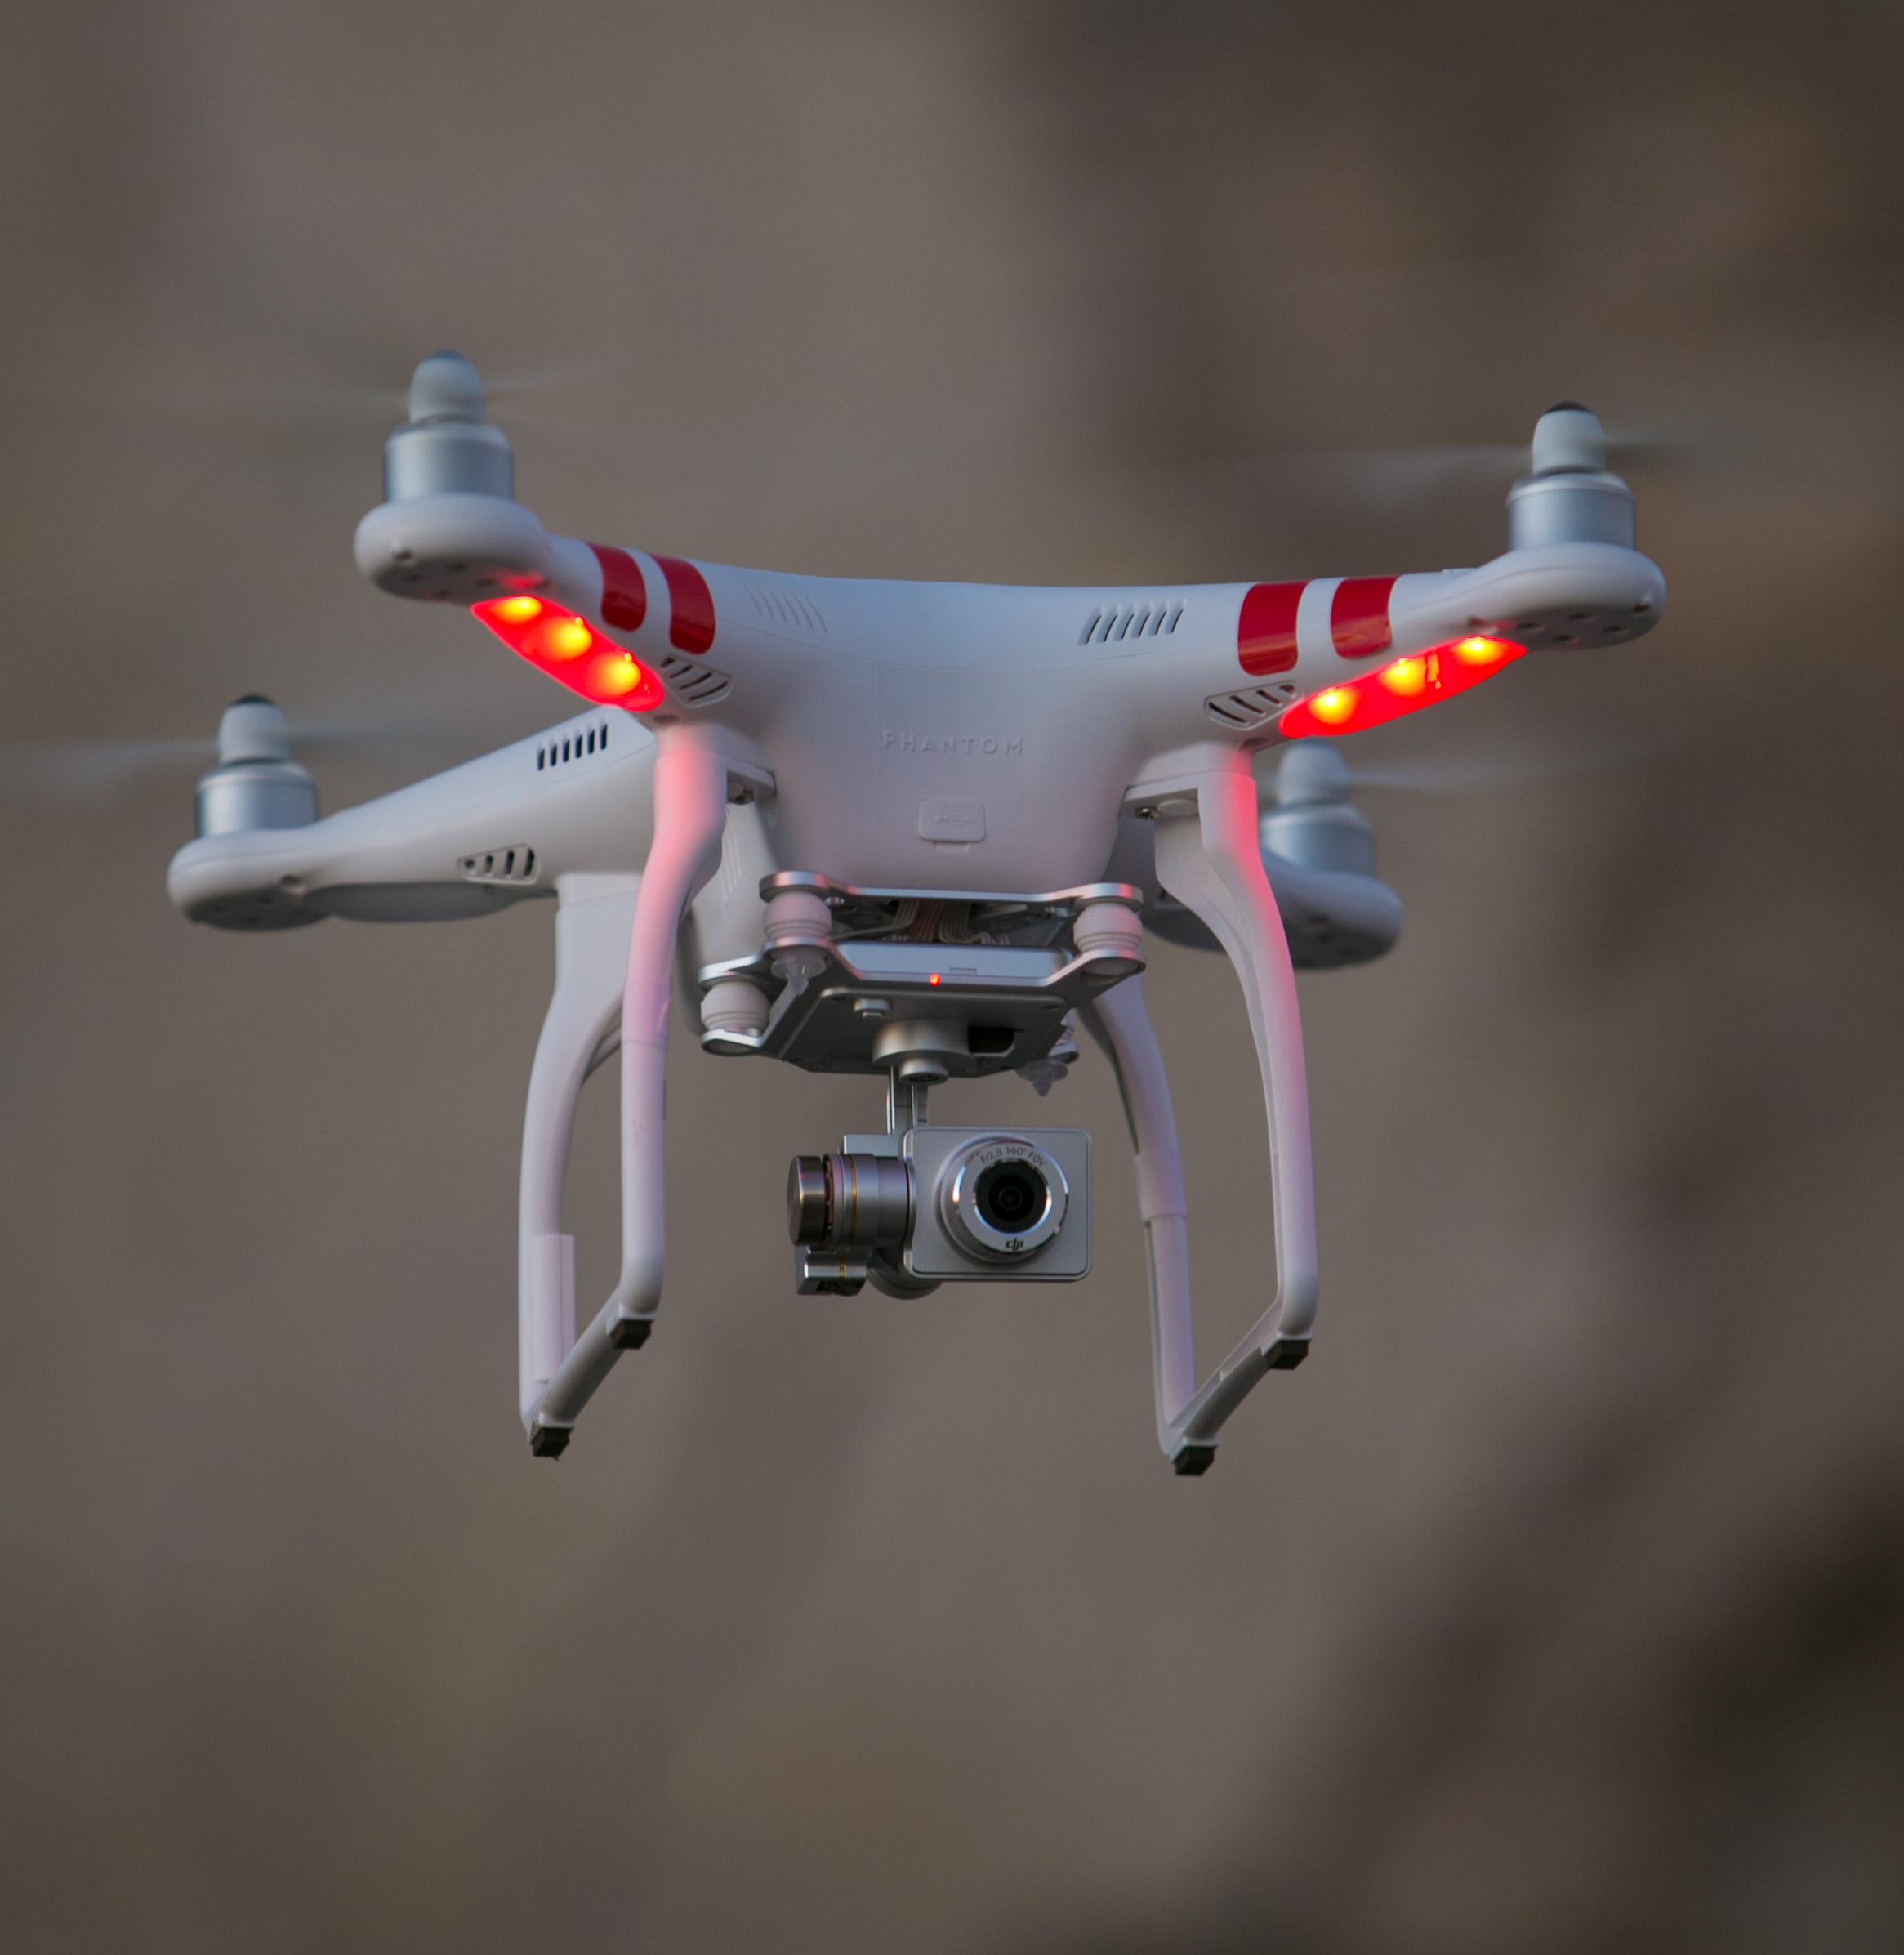 A Phantom drone buzzes above Gaviota State Beach at sunset on November 26, 2014, in Santa Barbara, California.